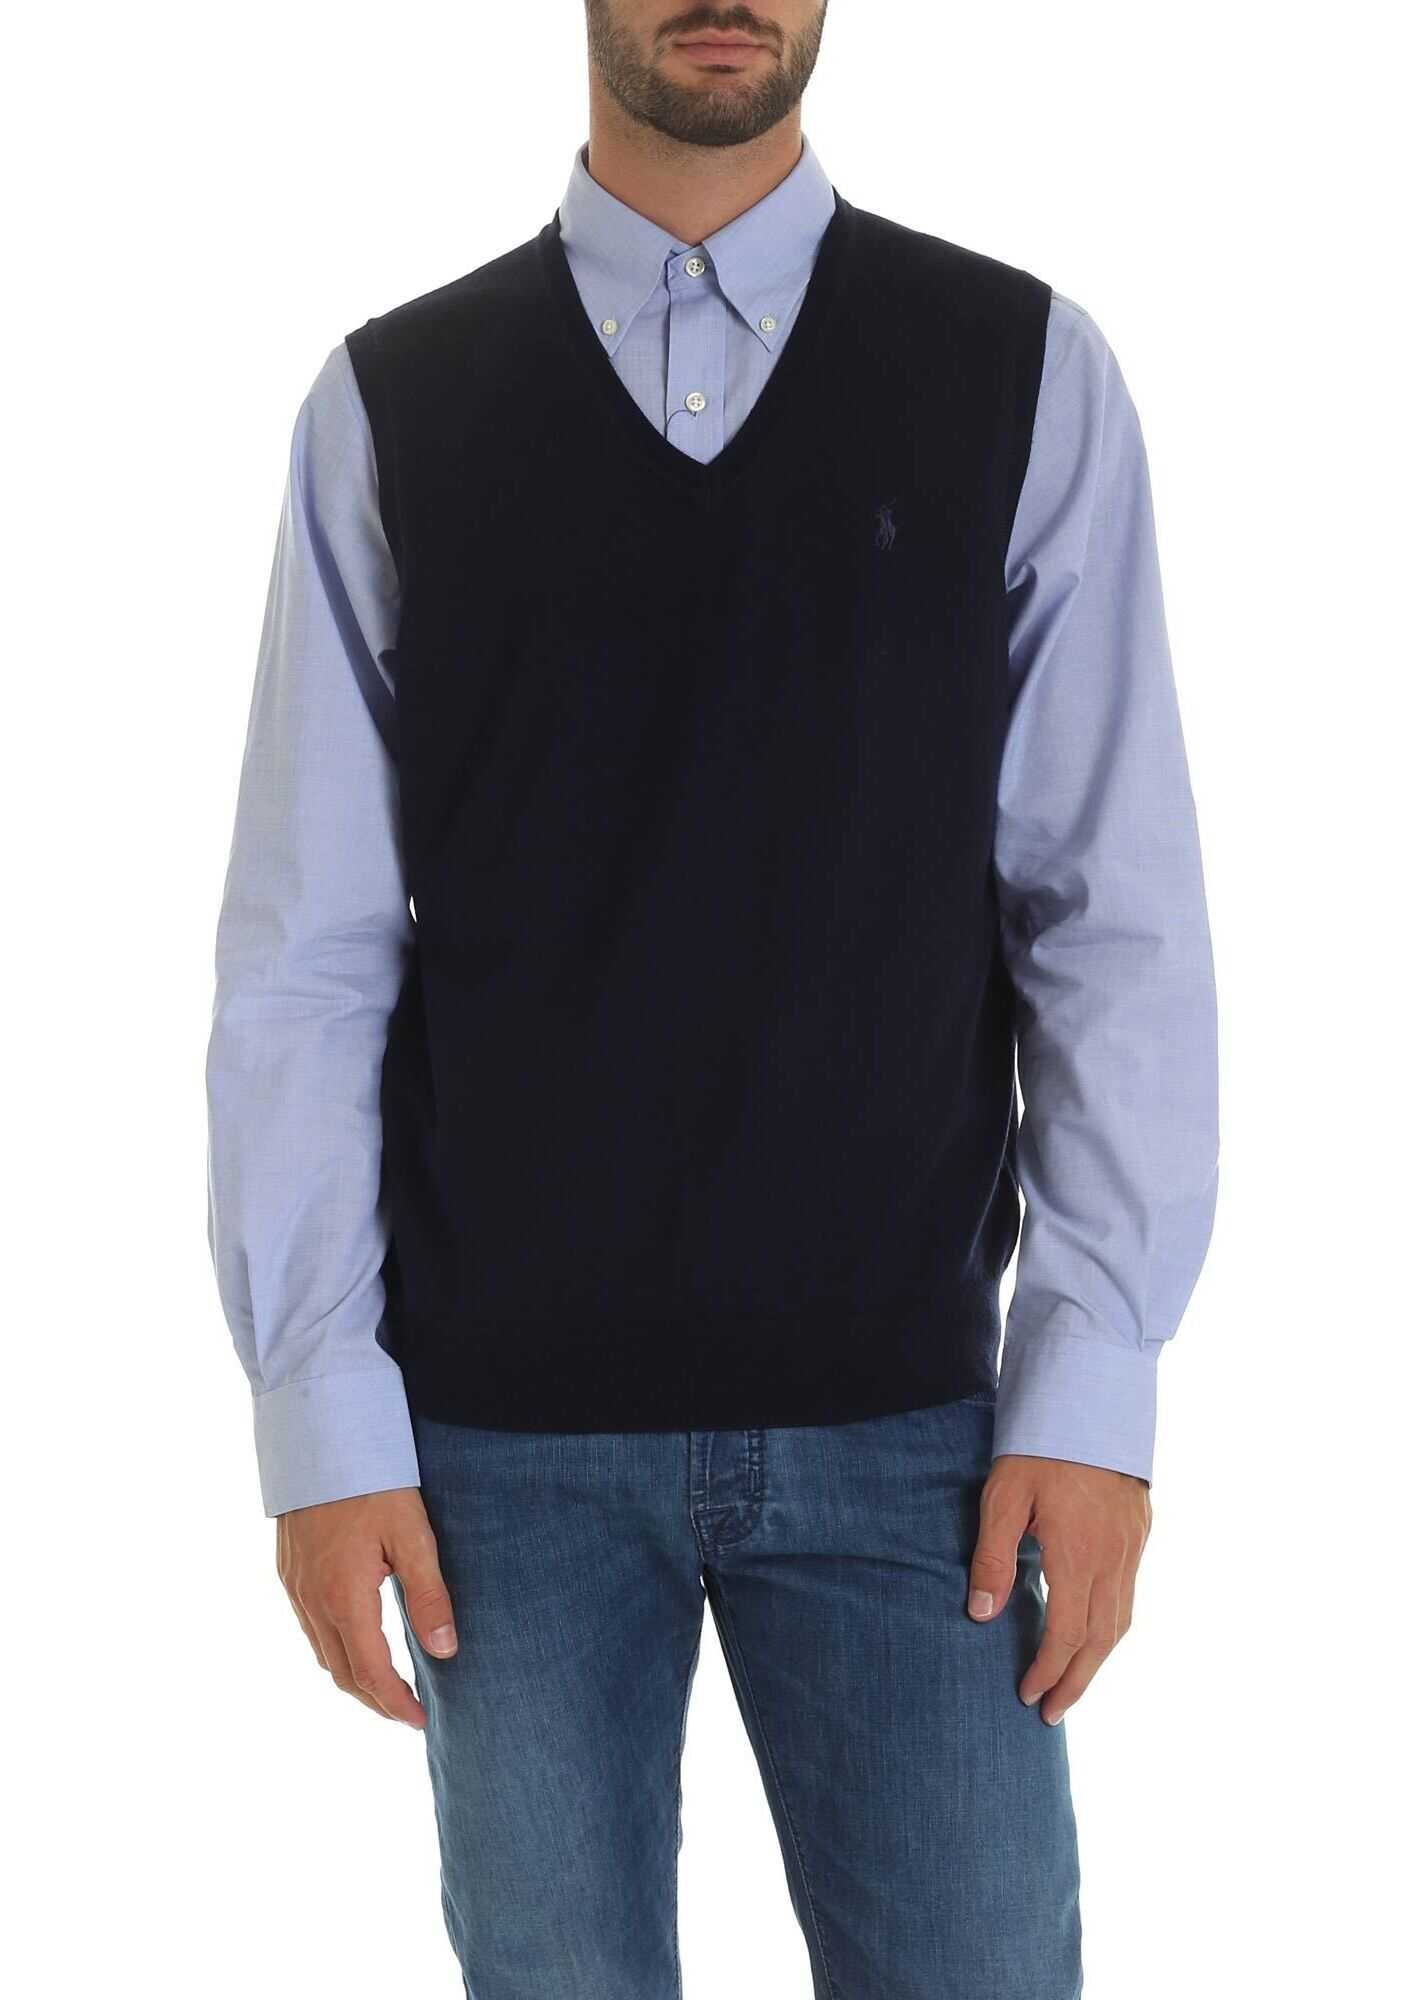 Ralph Lauren Blue Sleeveless Pullover With Logo Blue imagine